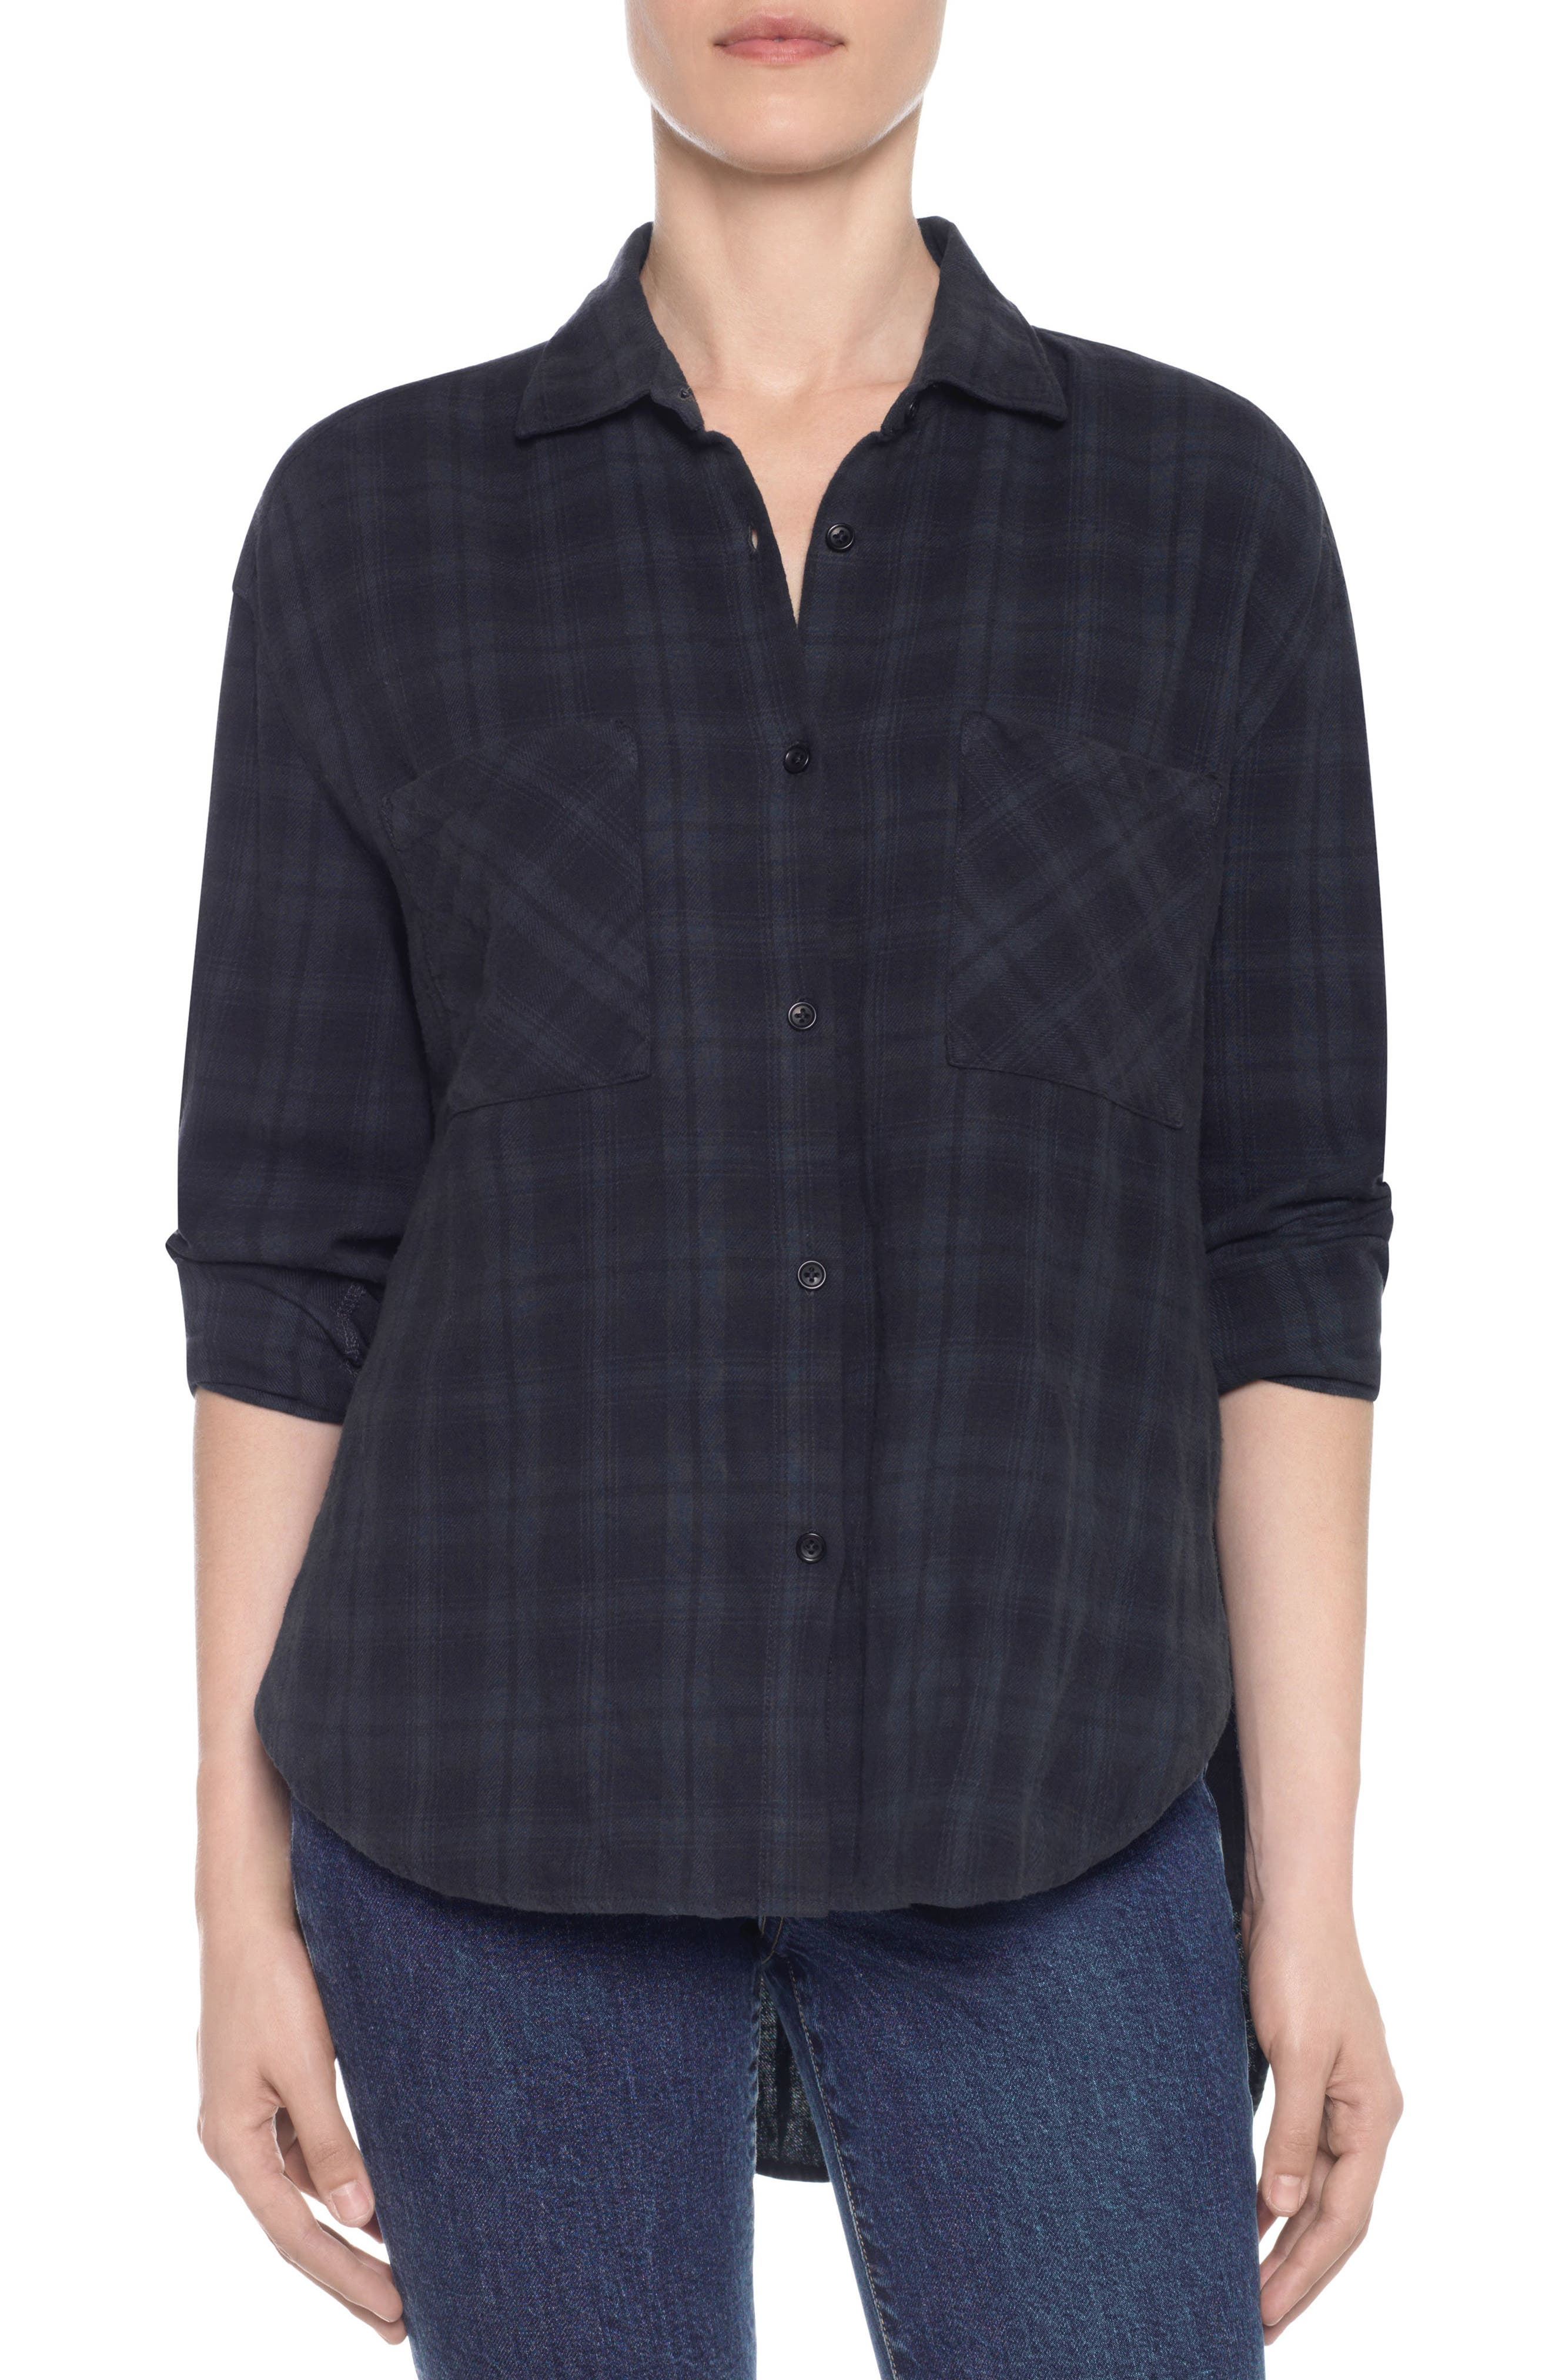 Alternate Image 1 Selected - Taylor Hill x Joe's Boyfriend Flannel Shirt